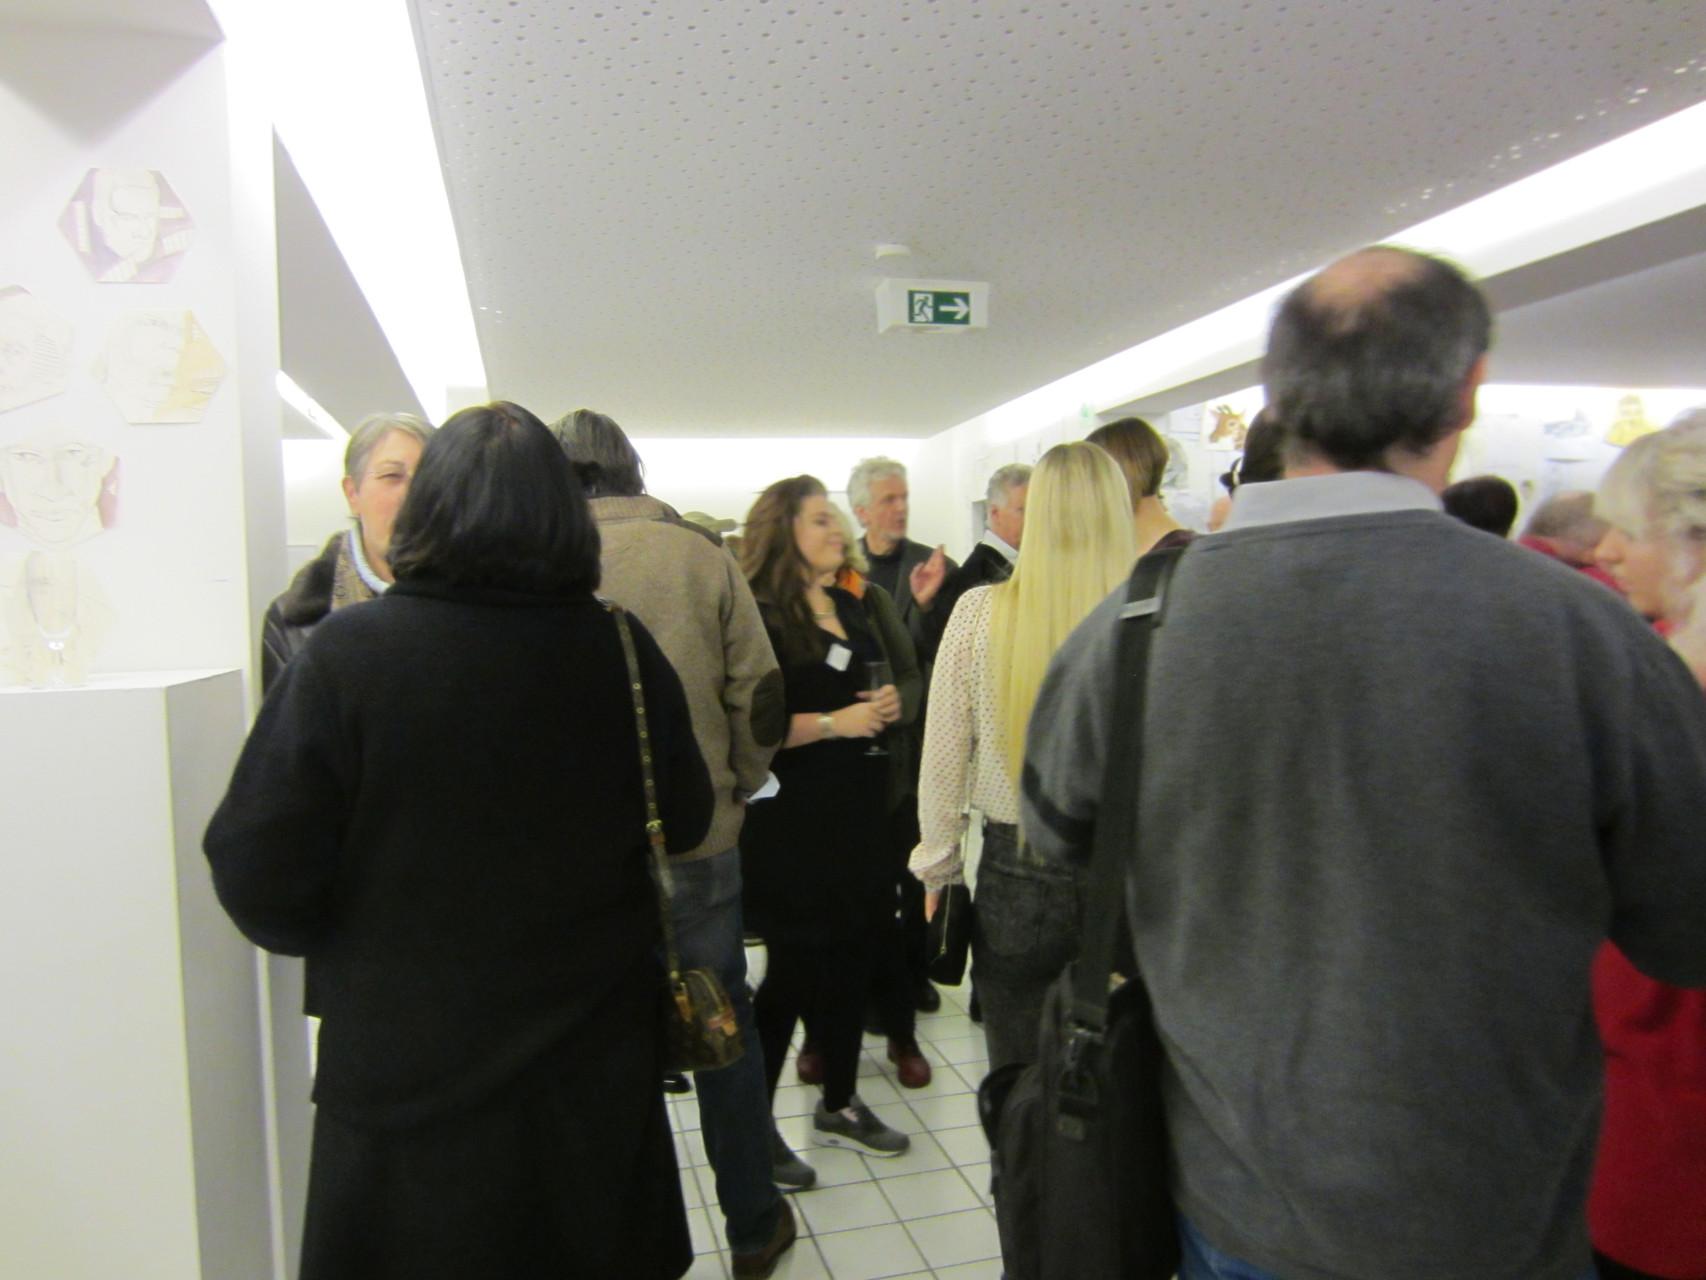 2015 02 Vernissage des Landeskunstgymnasium